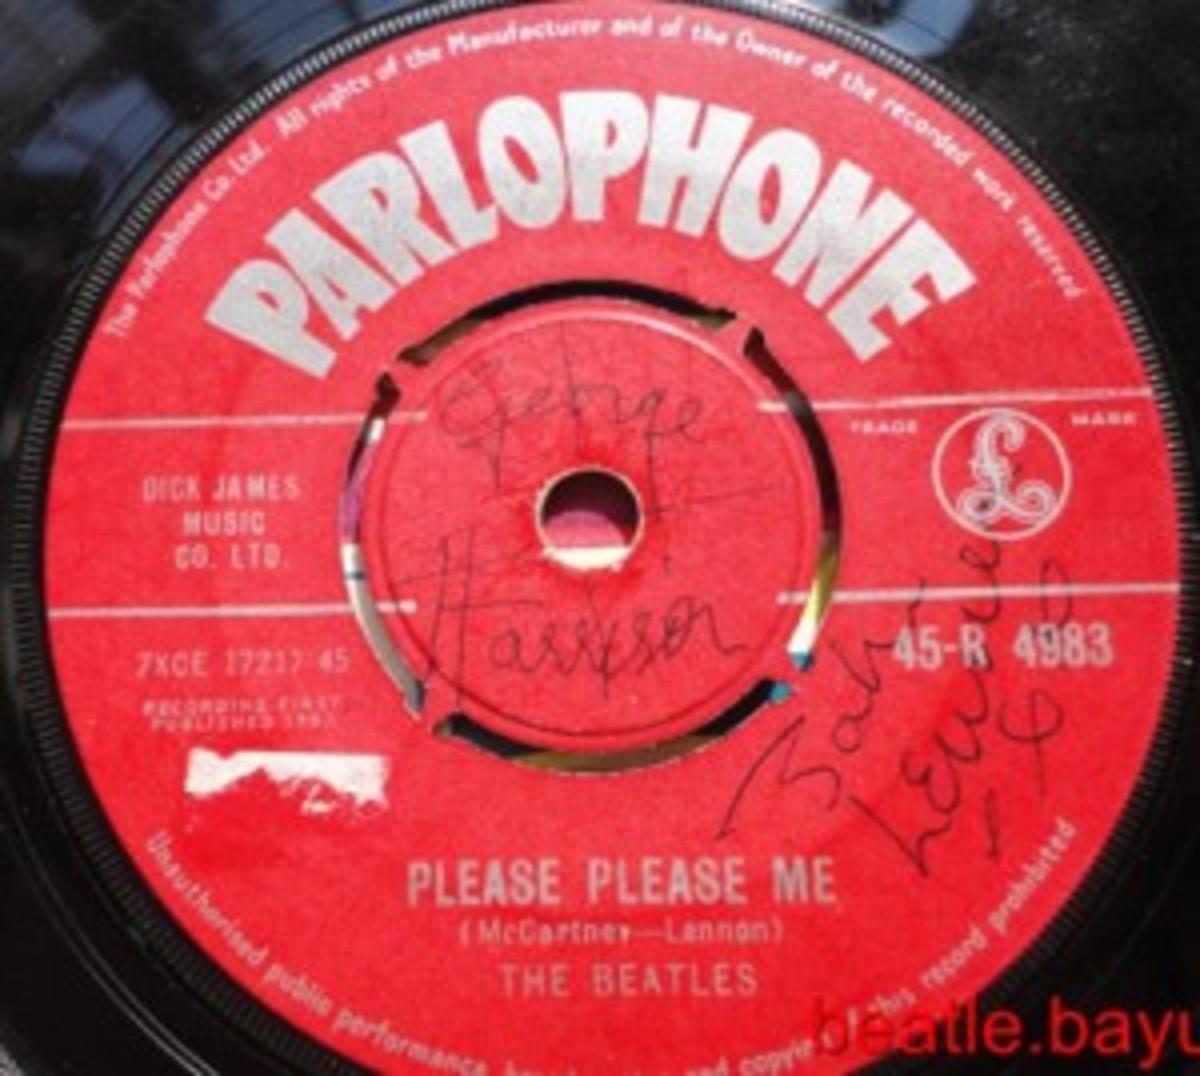 The Beatles Please Please Me 45